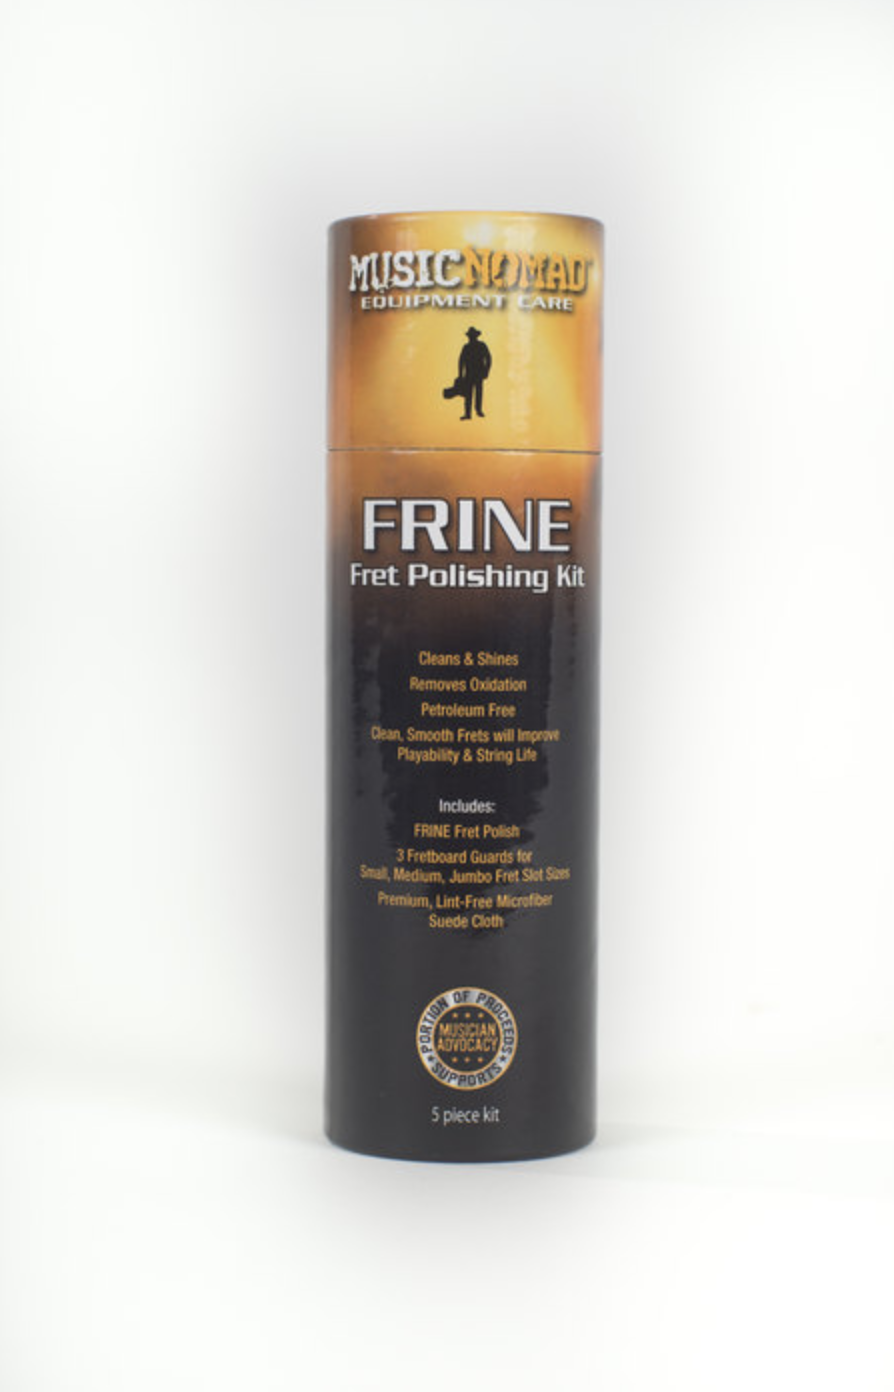 Frine Fret Polishing KiT MN124-2